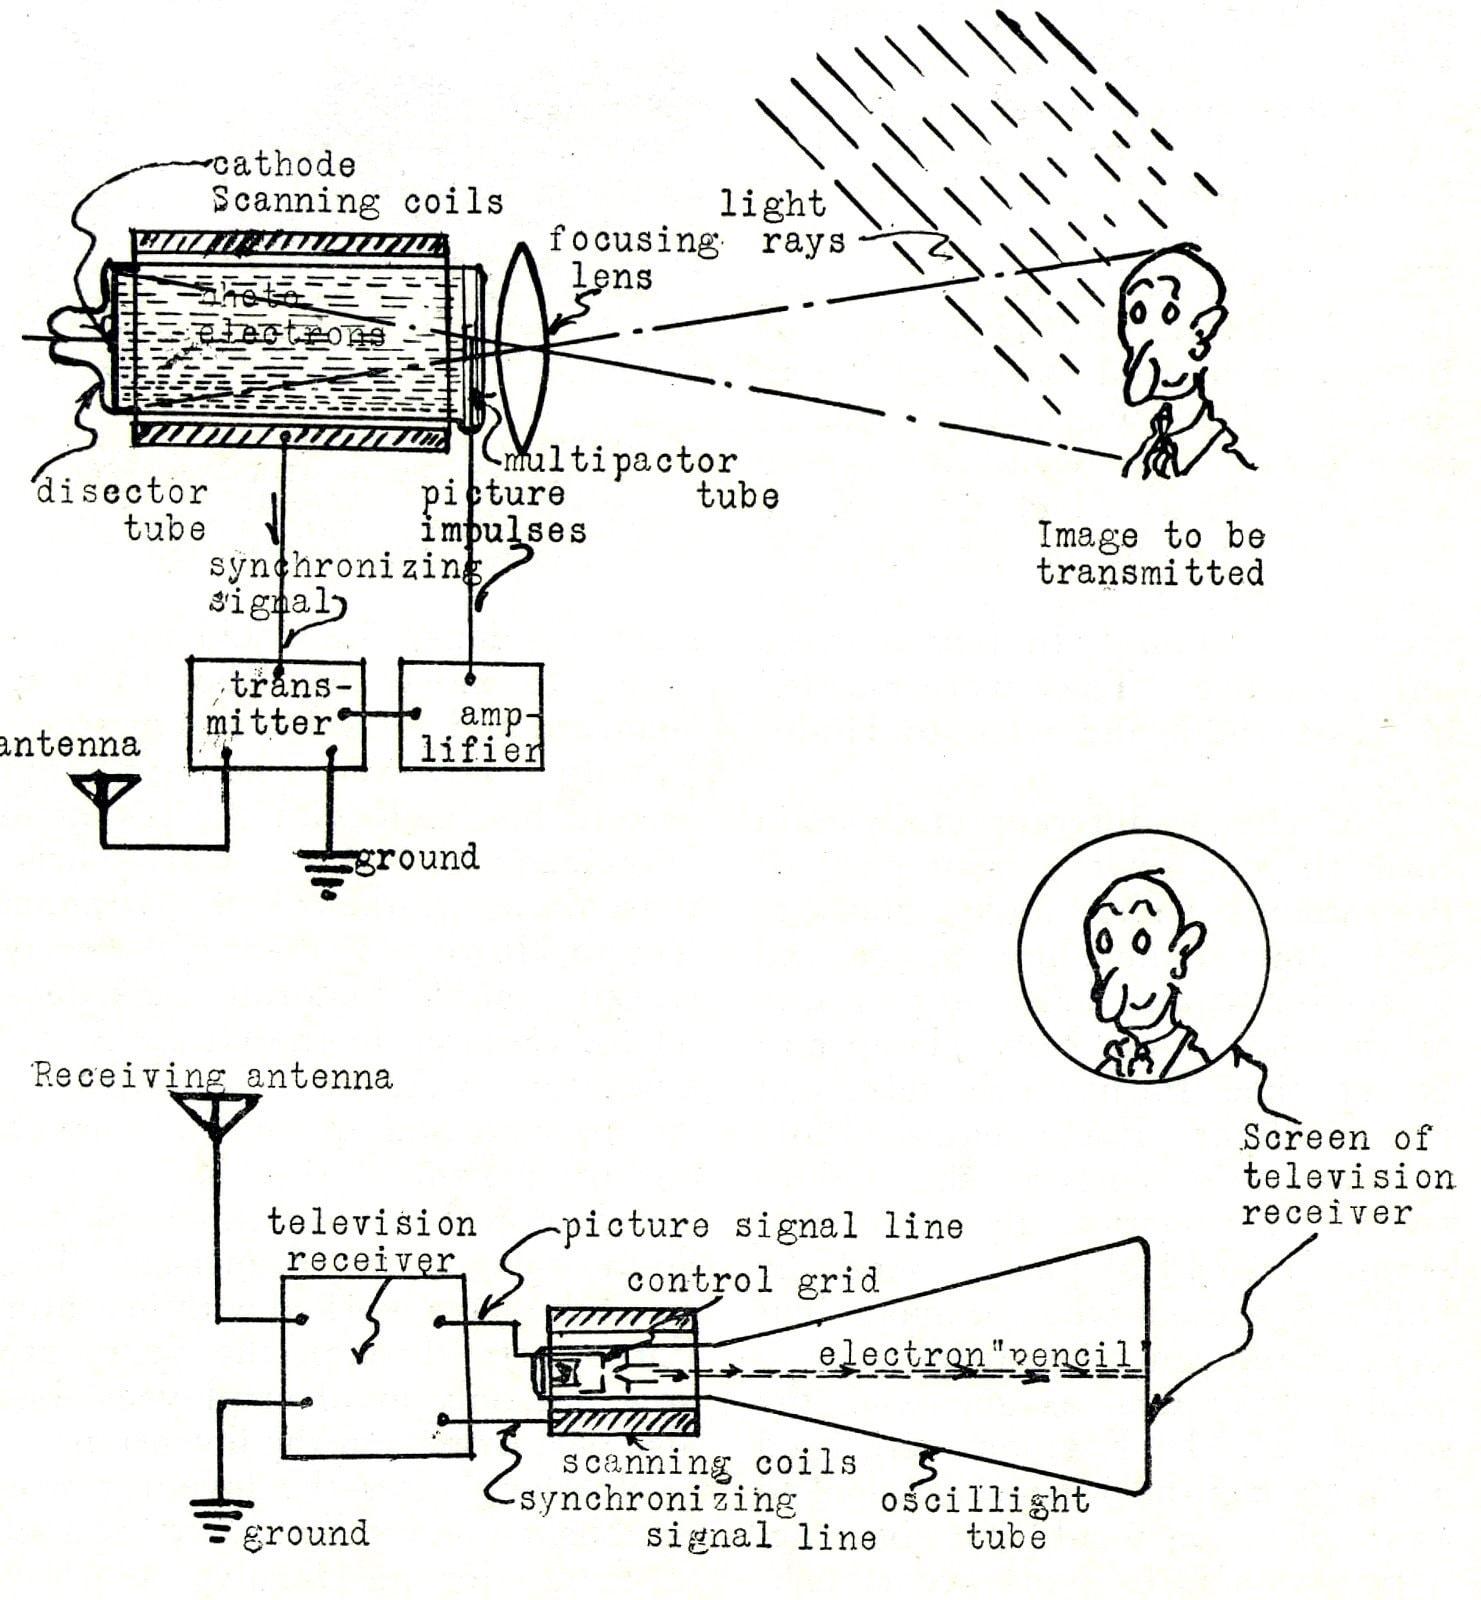 Philo Farnsworth - Inventor of television